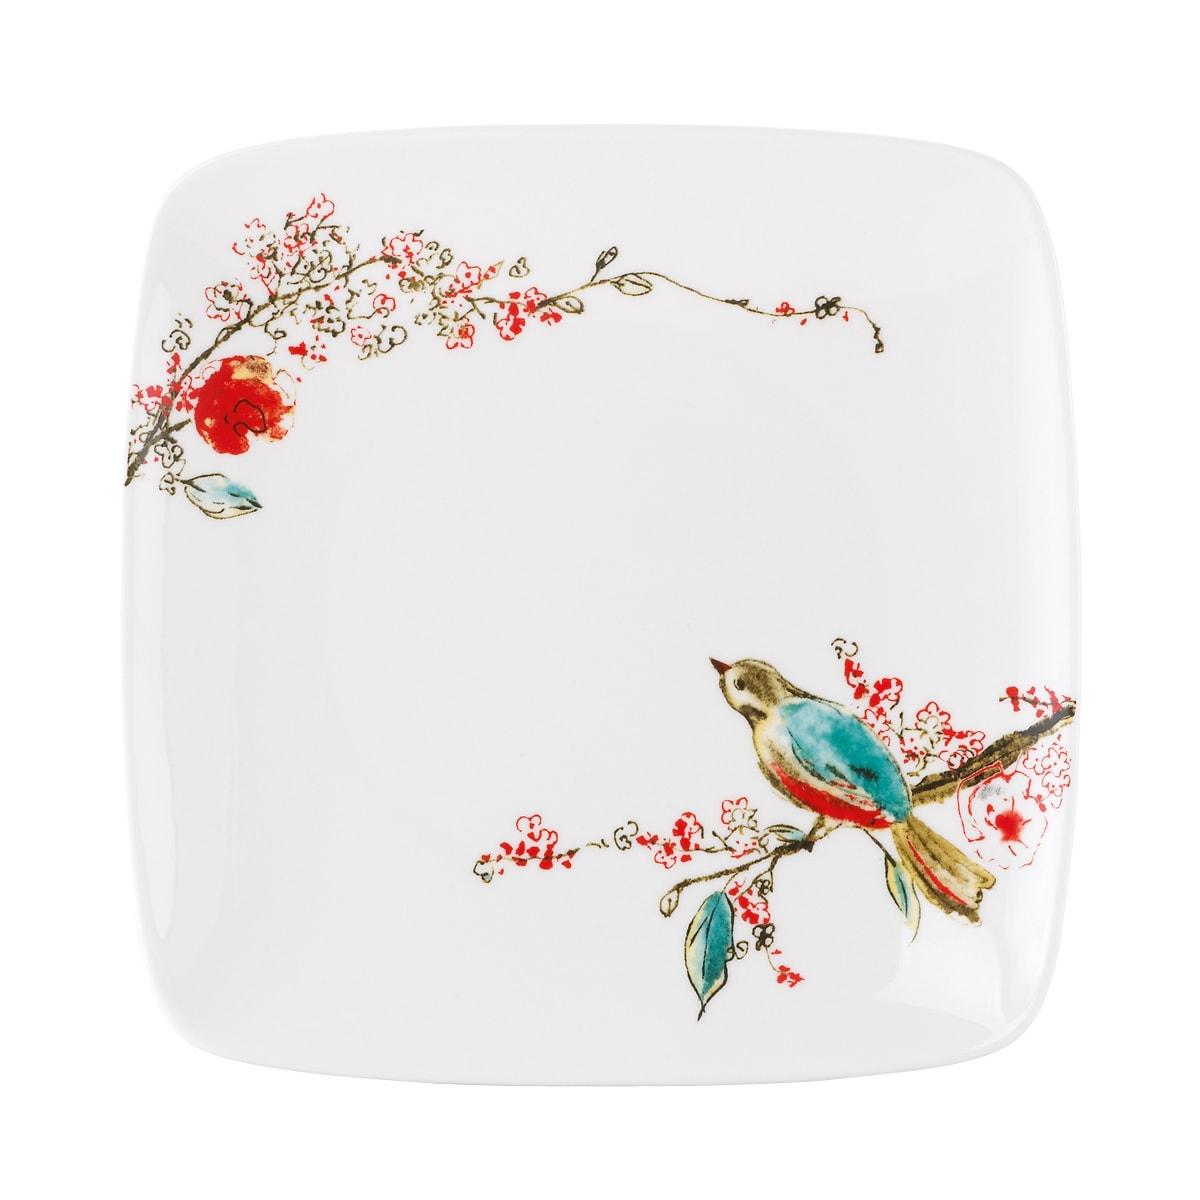 Lenox Chirp' Square Accent Plate, Multi (Bone China, Floral)